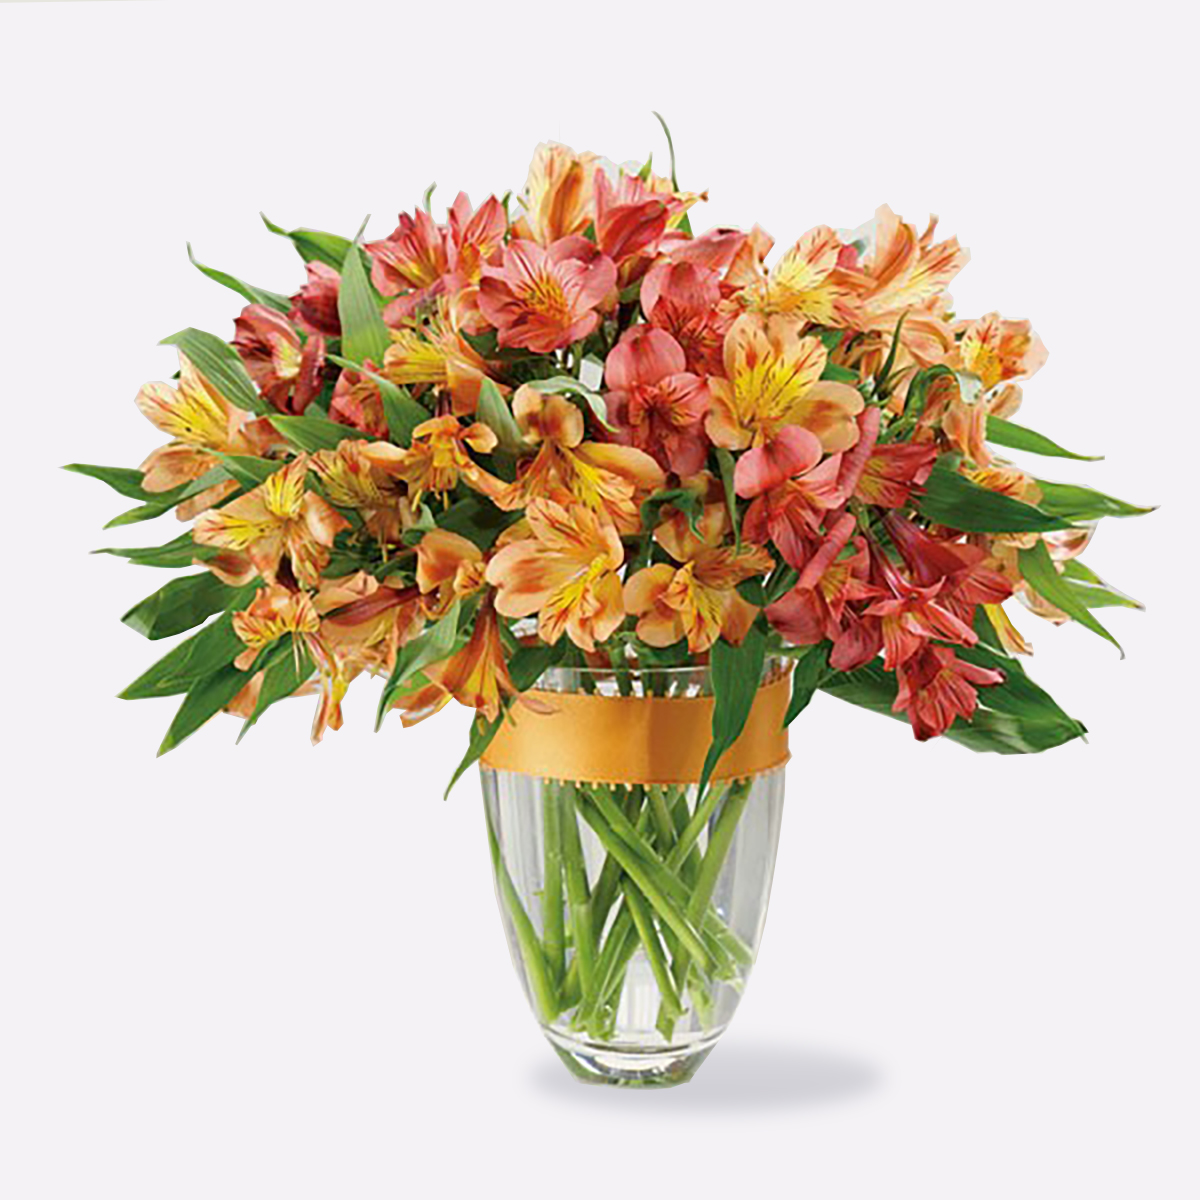 Awesome Alstroemeria Floral Arrangement